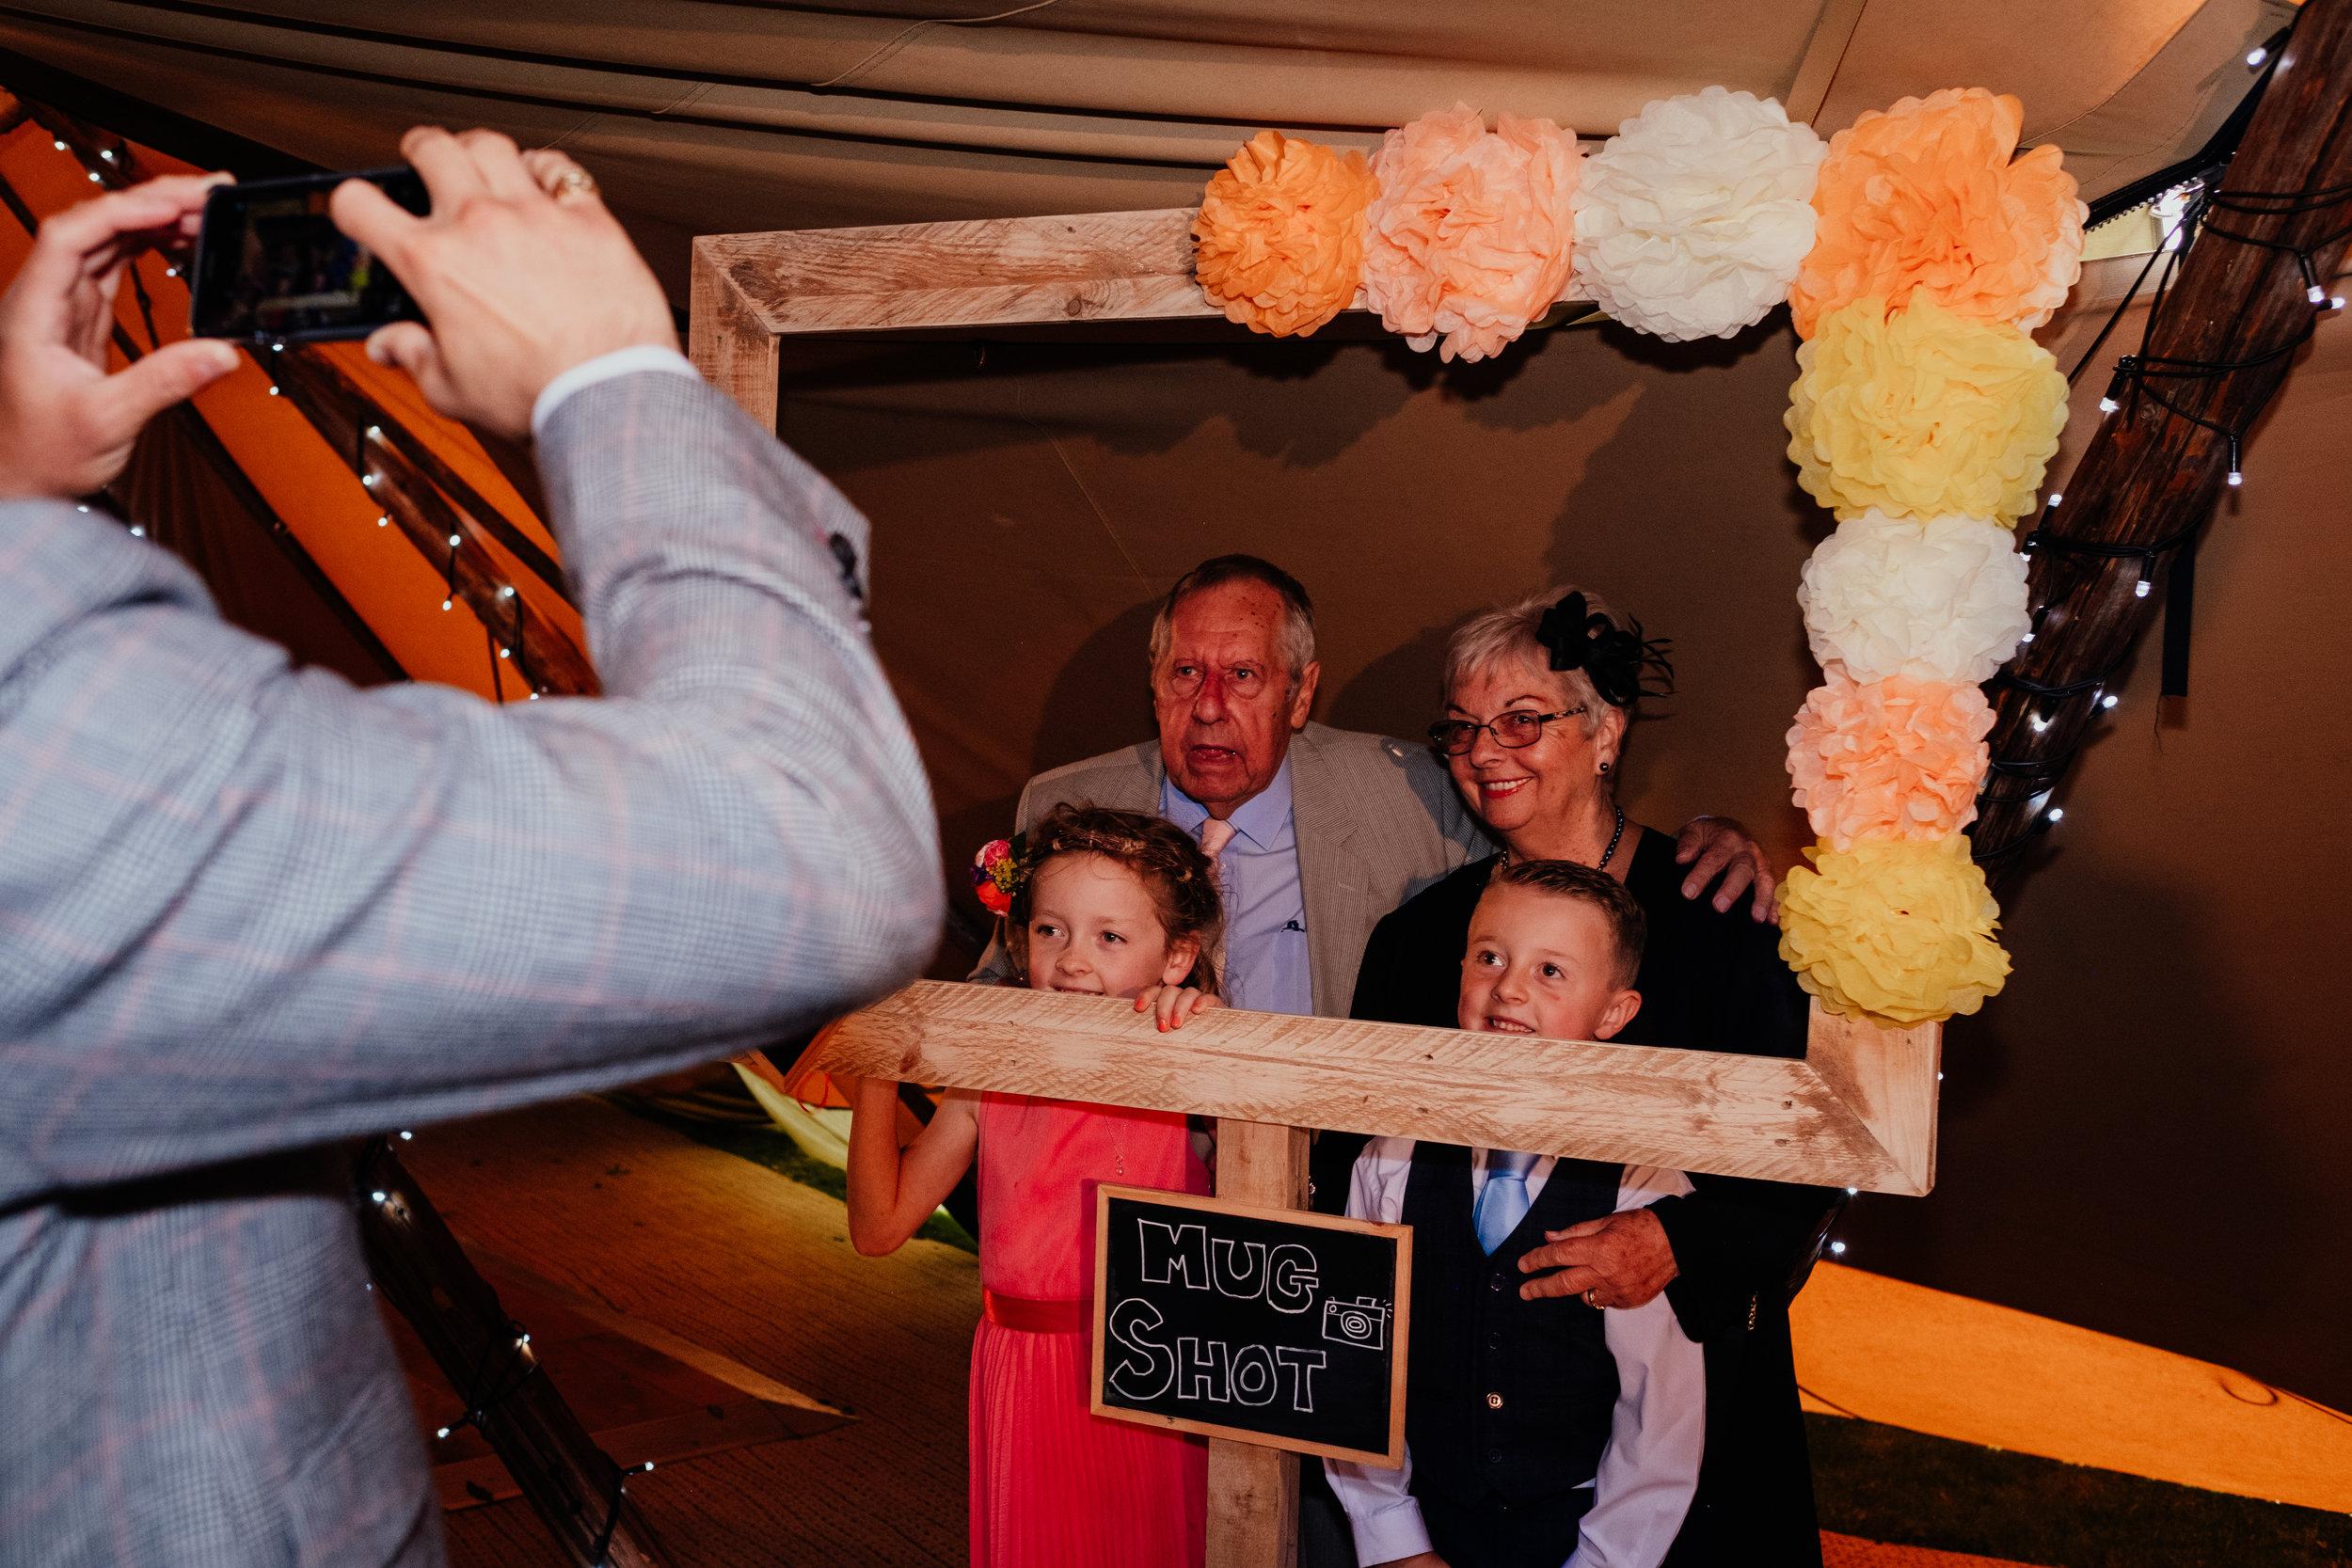 Family taking photos at tipi wedding